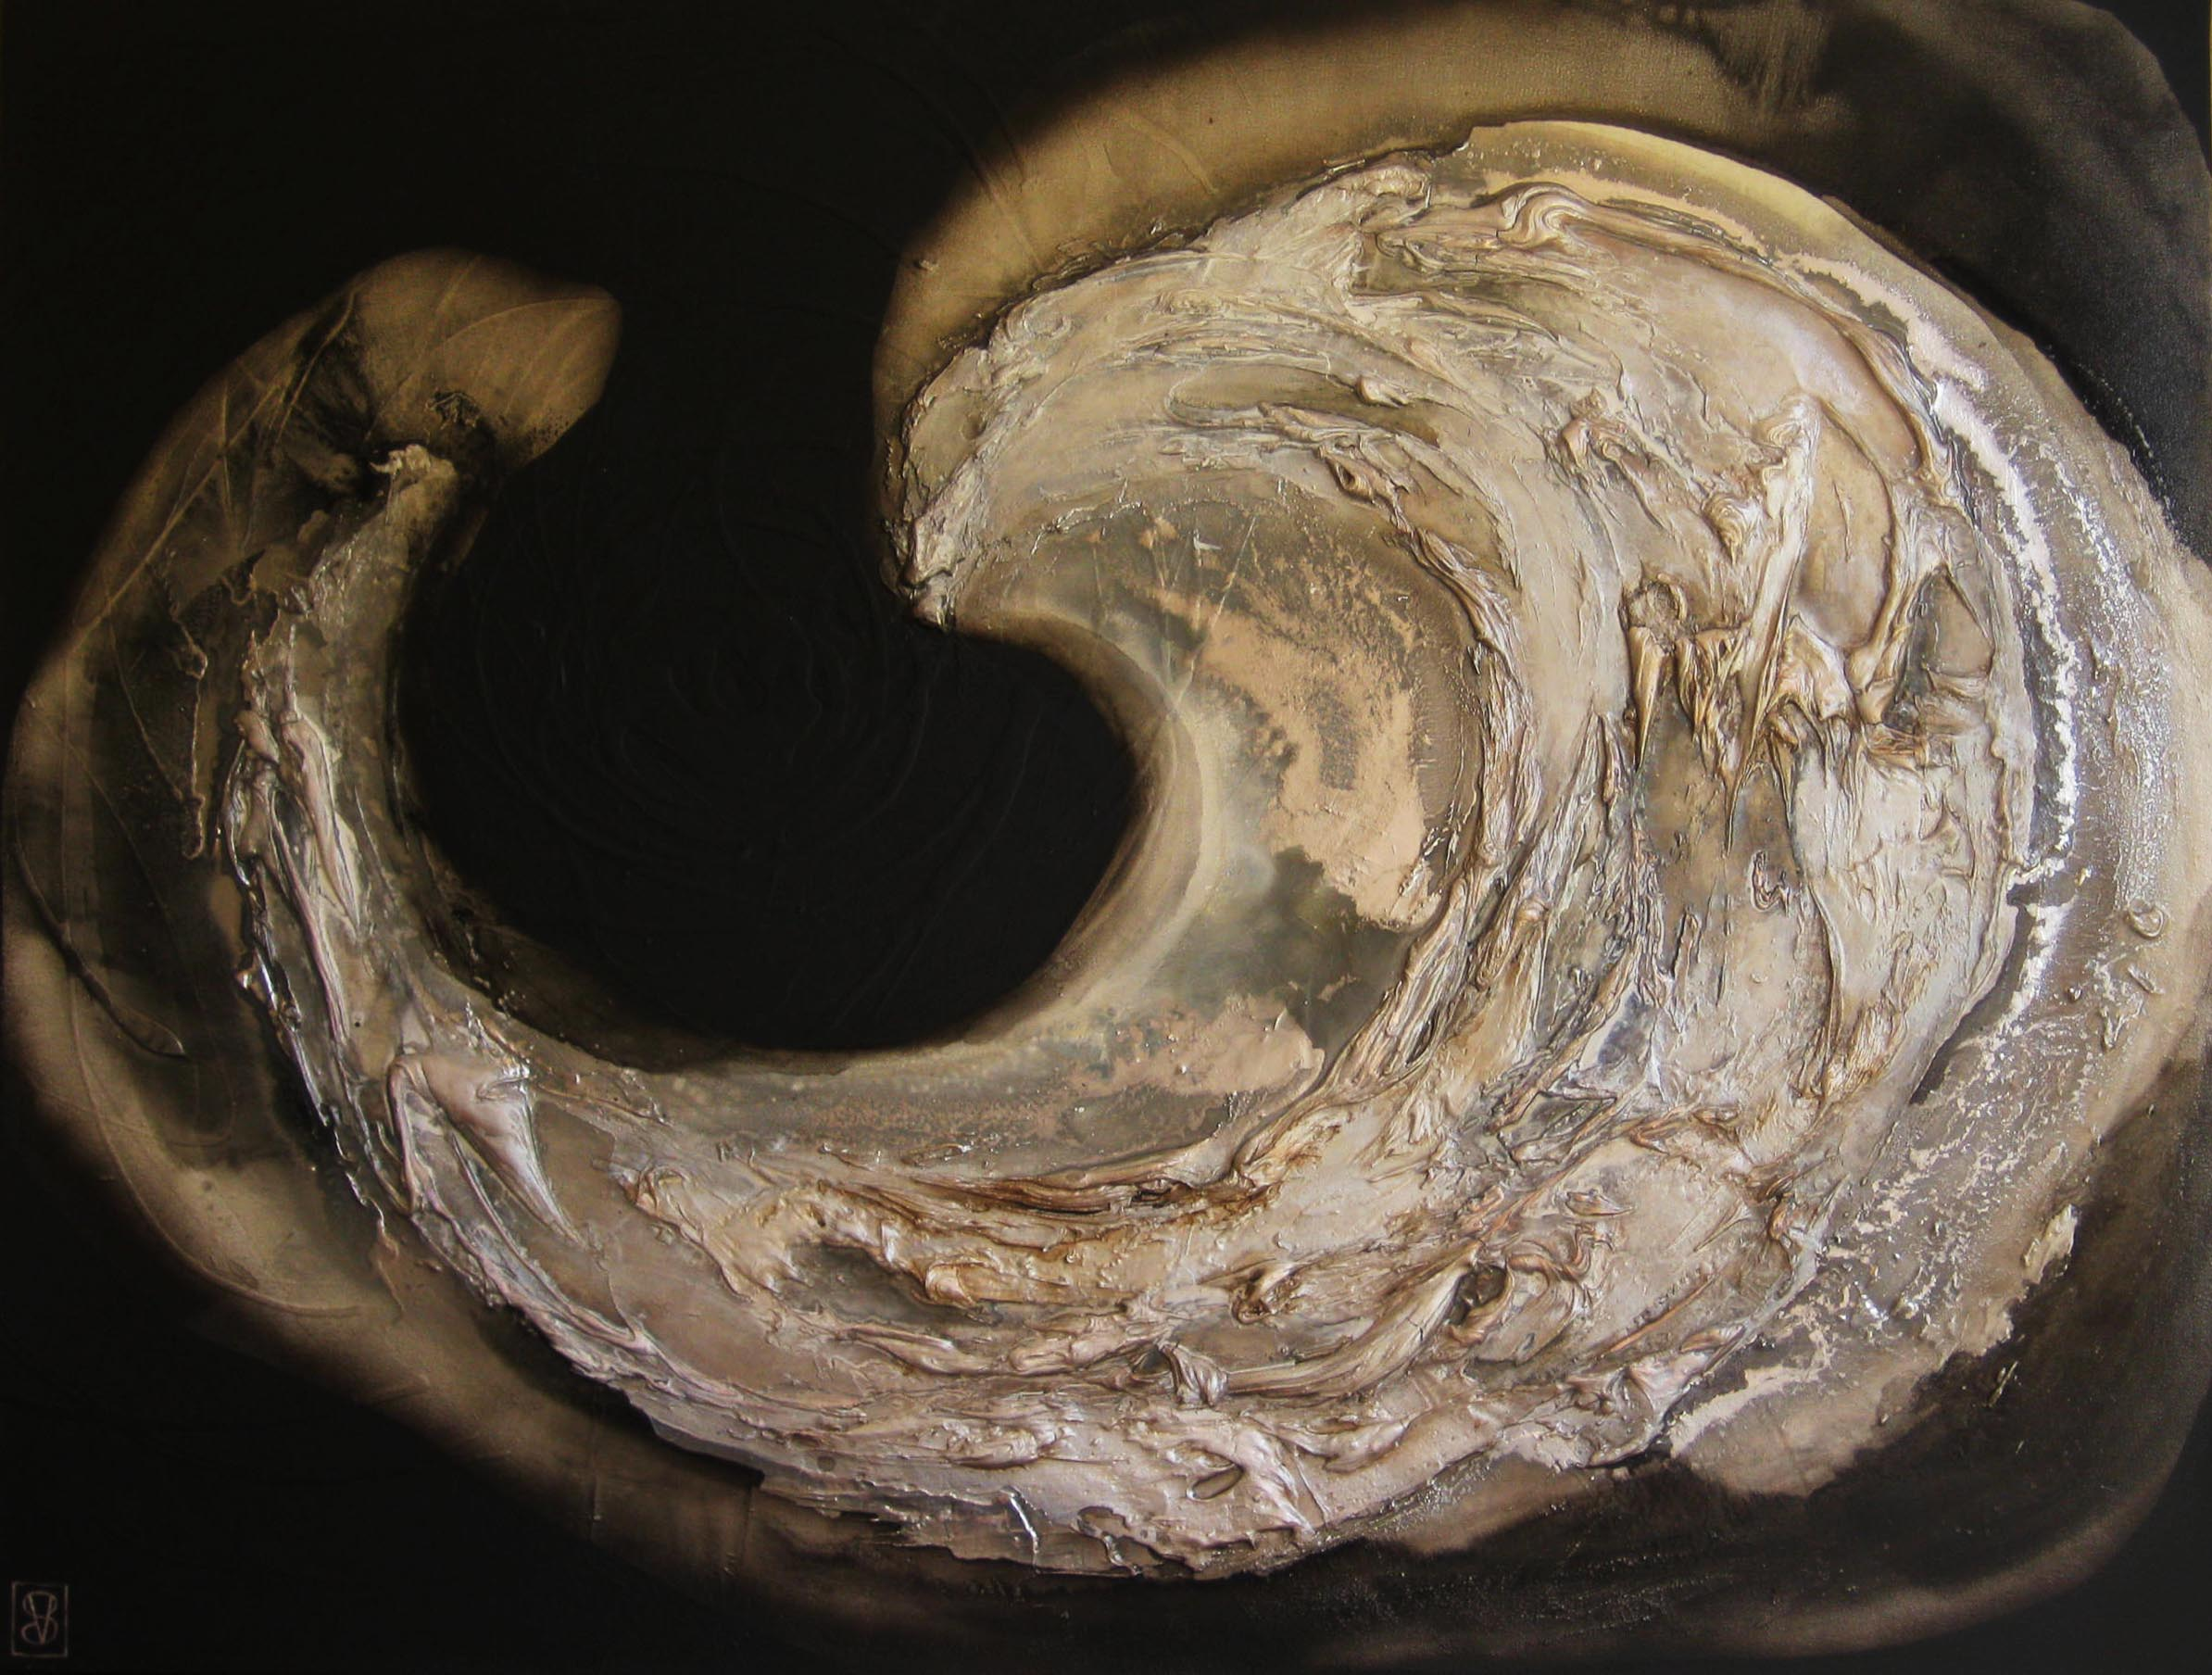 Vicky Sanders Oyster Series - Black Pearl #1